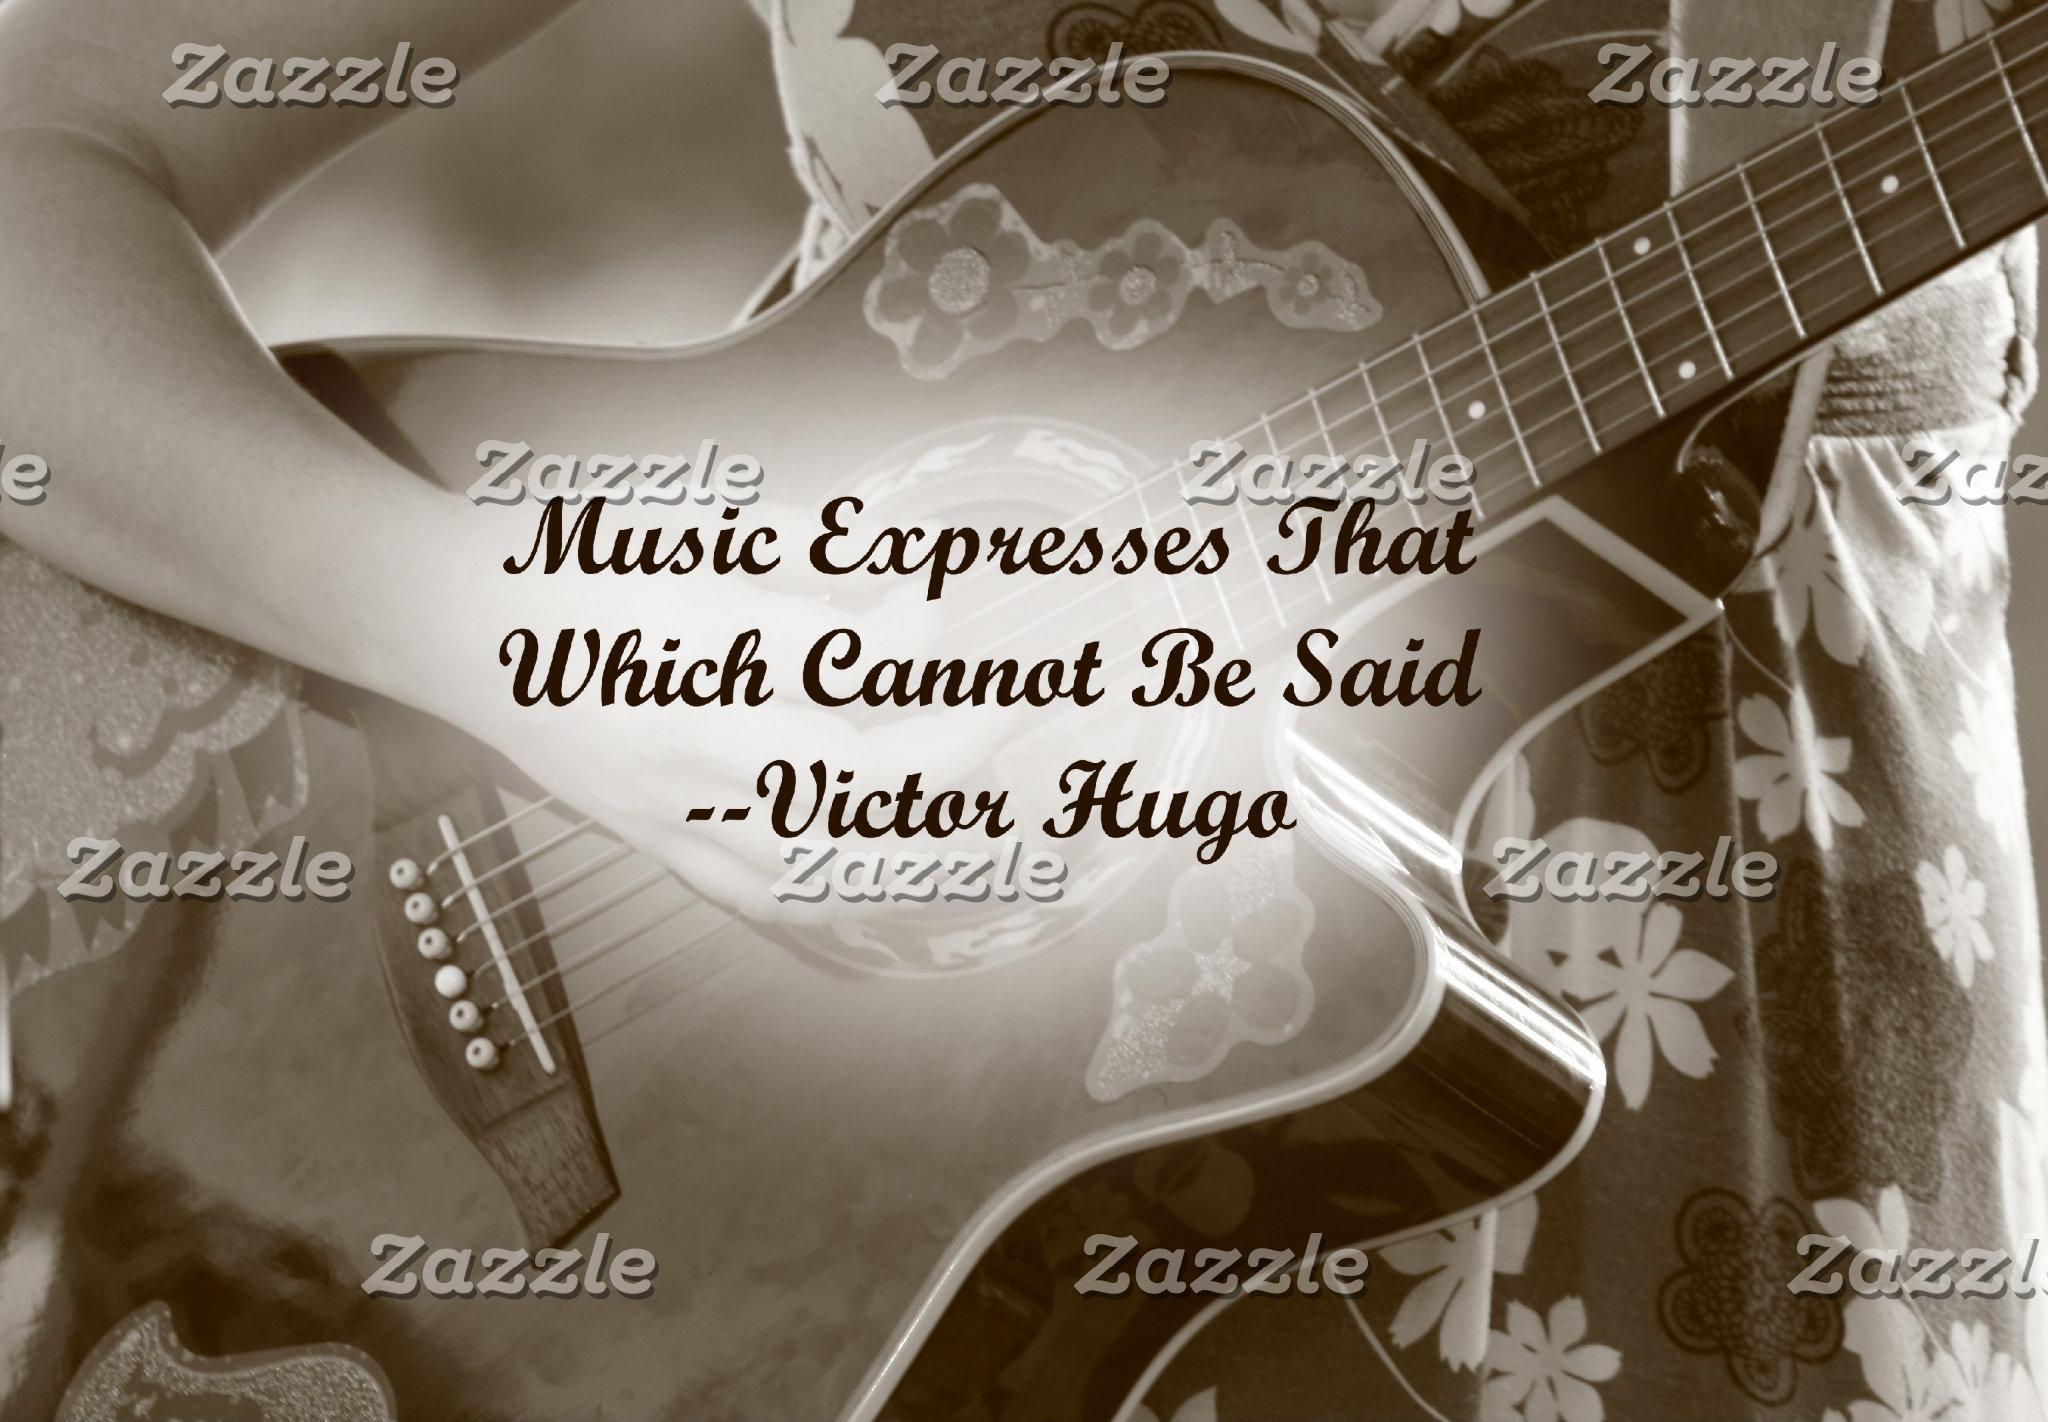 Music Expresses that guitar saying